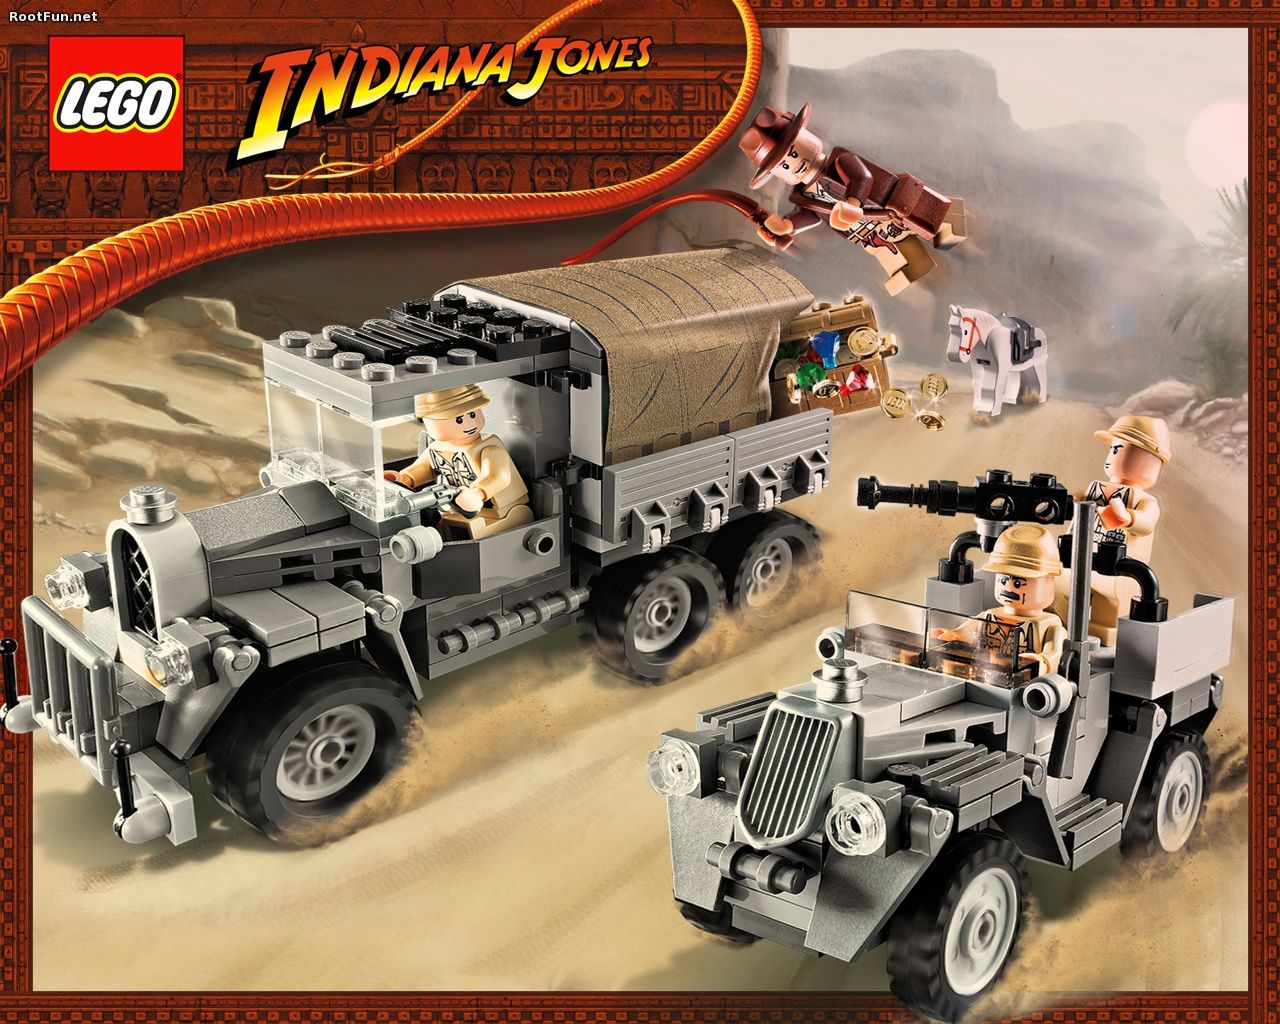 lego indiana jones - Google Search  f6c47c9a9c8